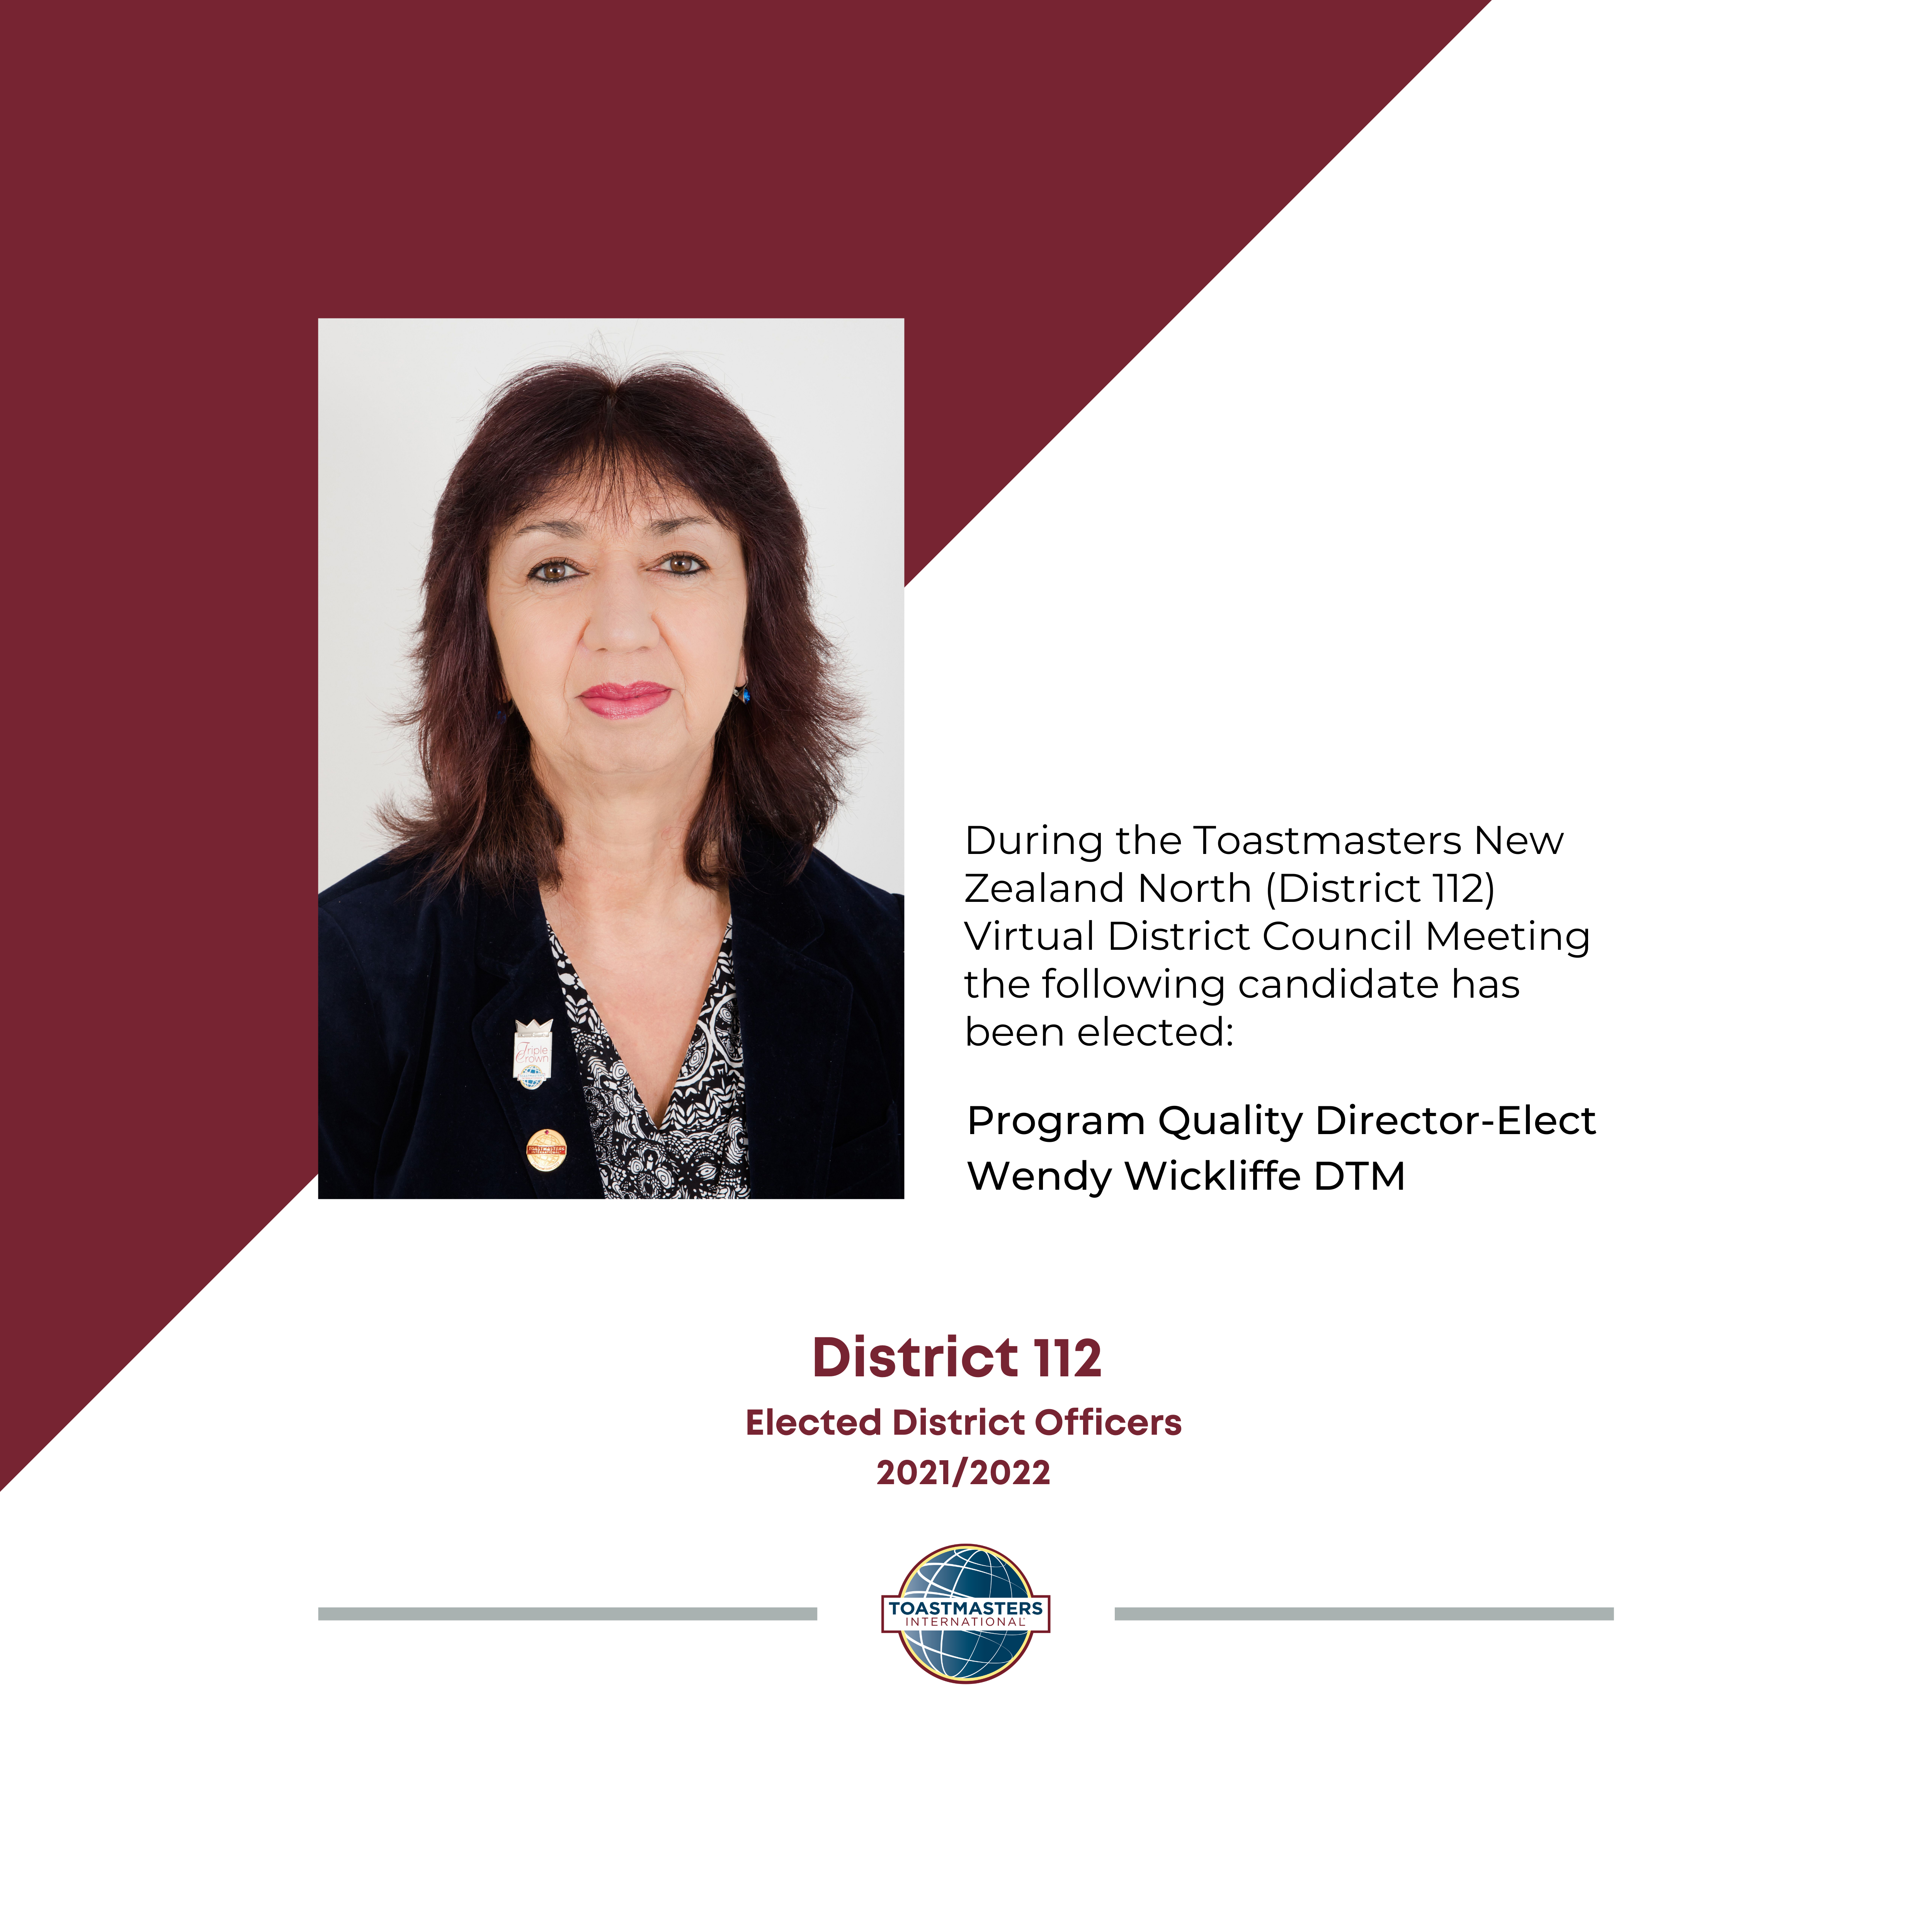 Program Quality Director Elect Wendy Wickliffe DTM